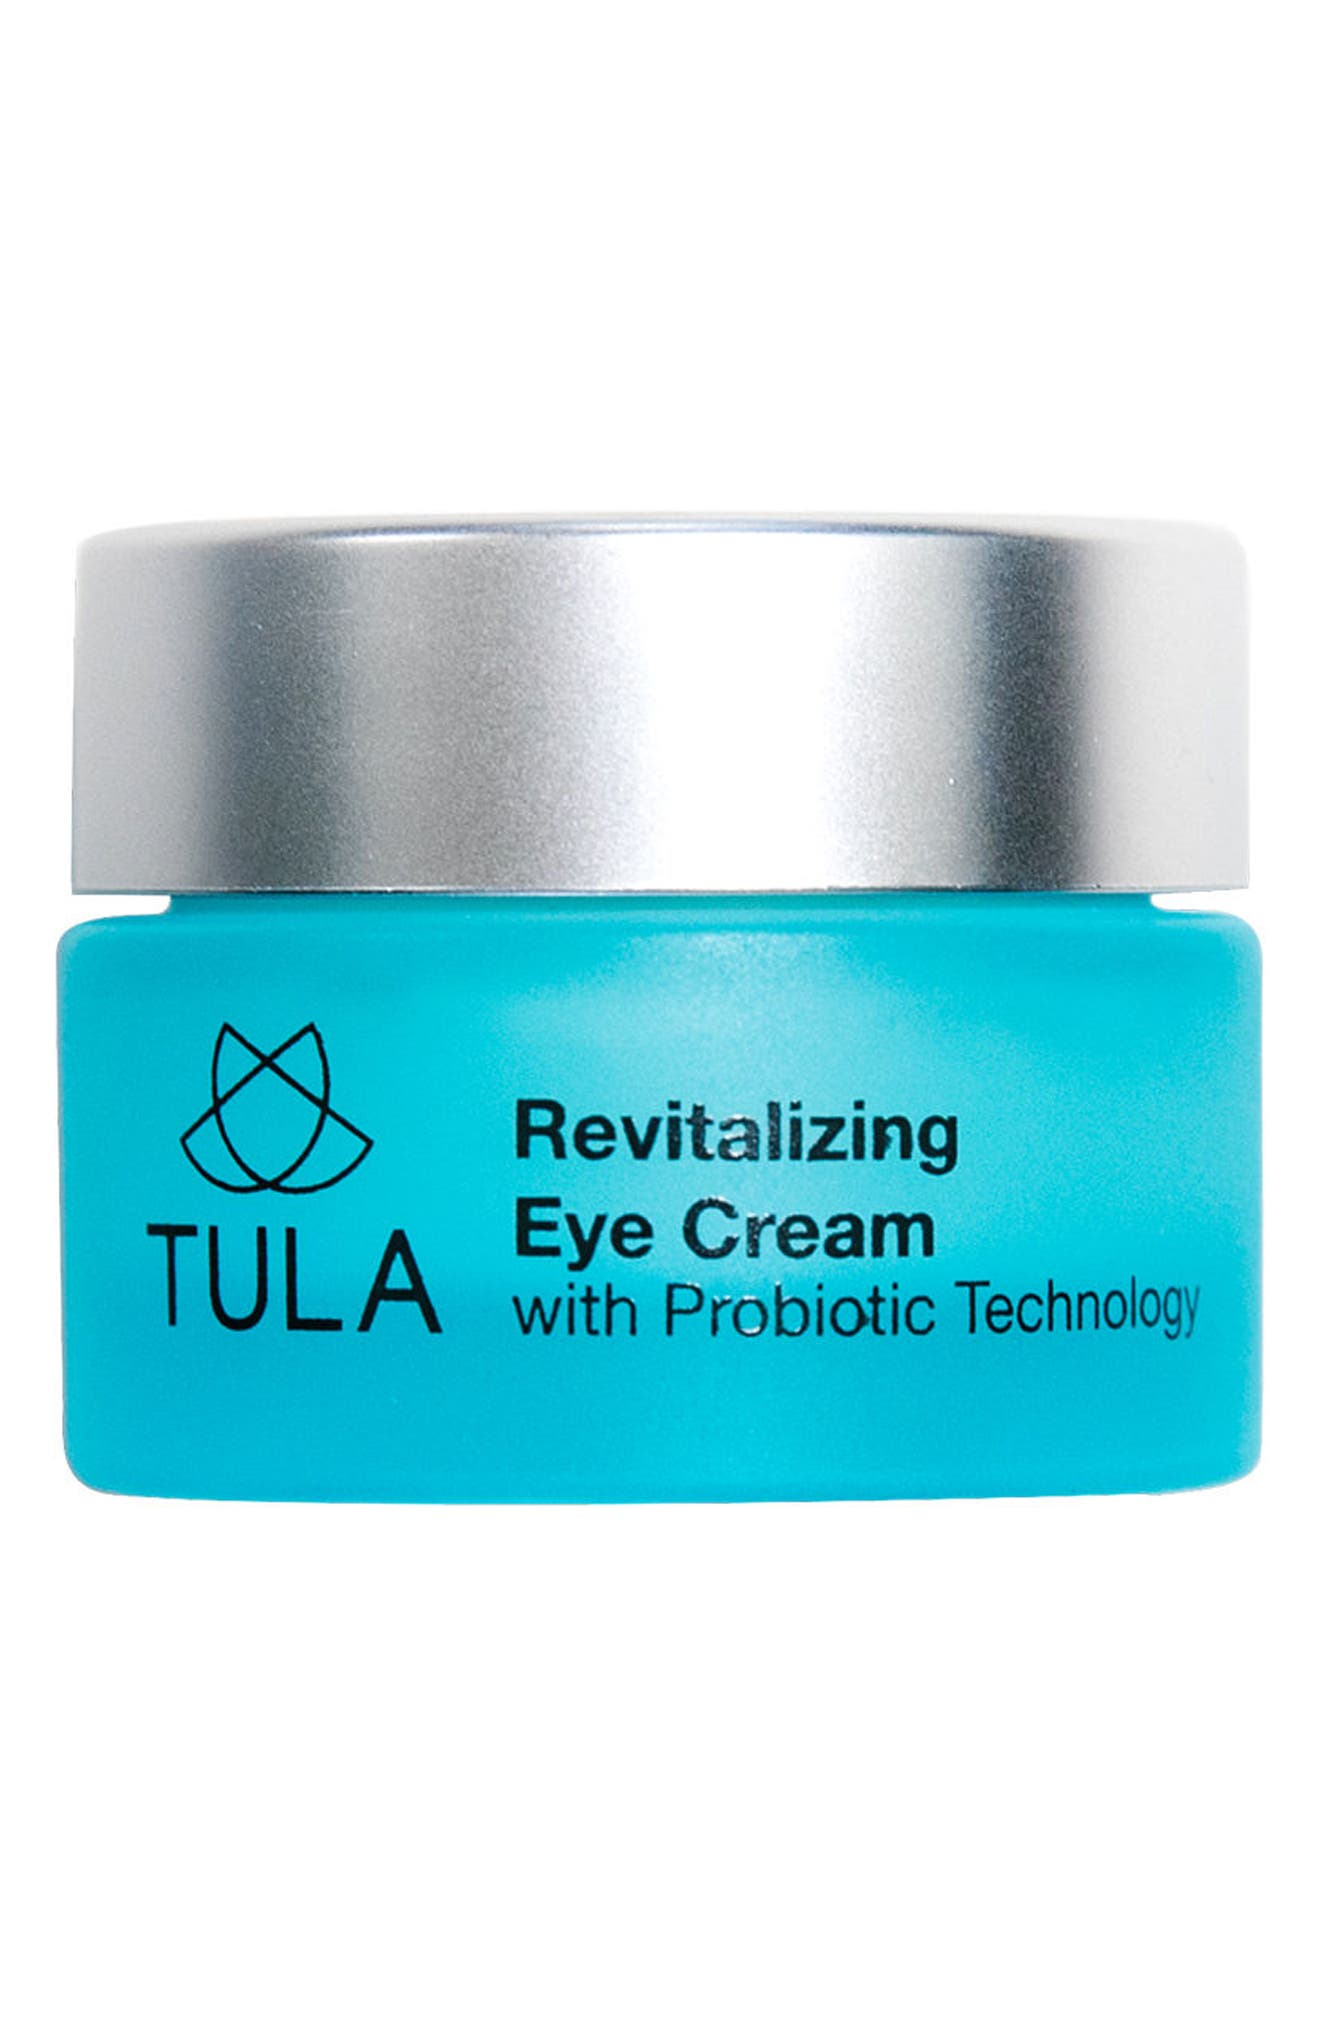 Tula Probiotic Skincare Revitalizing Eye Cream